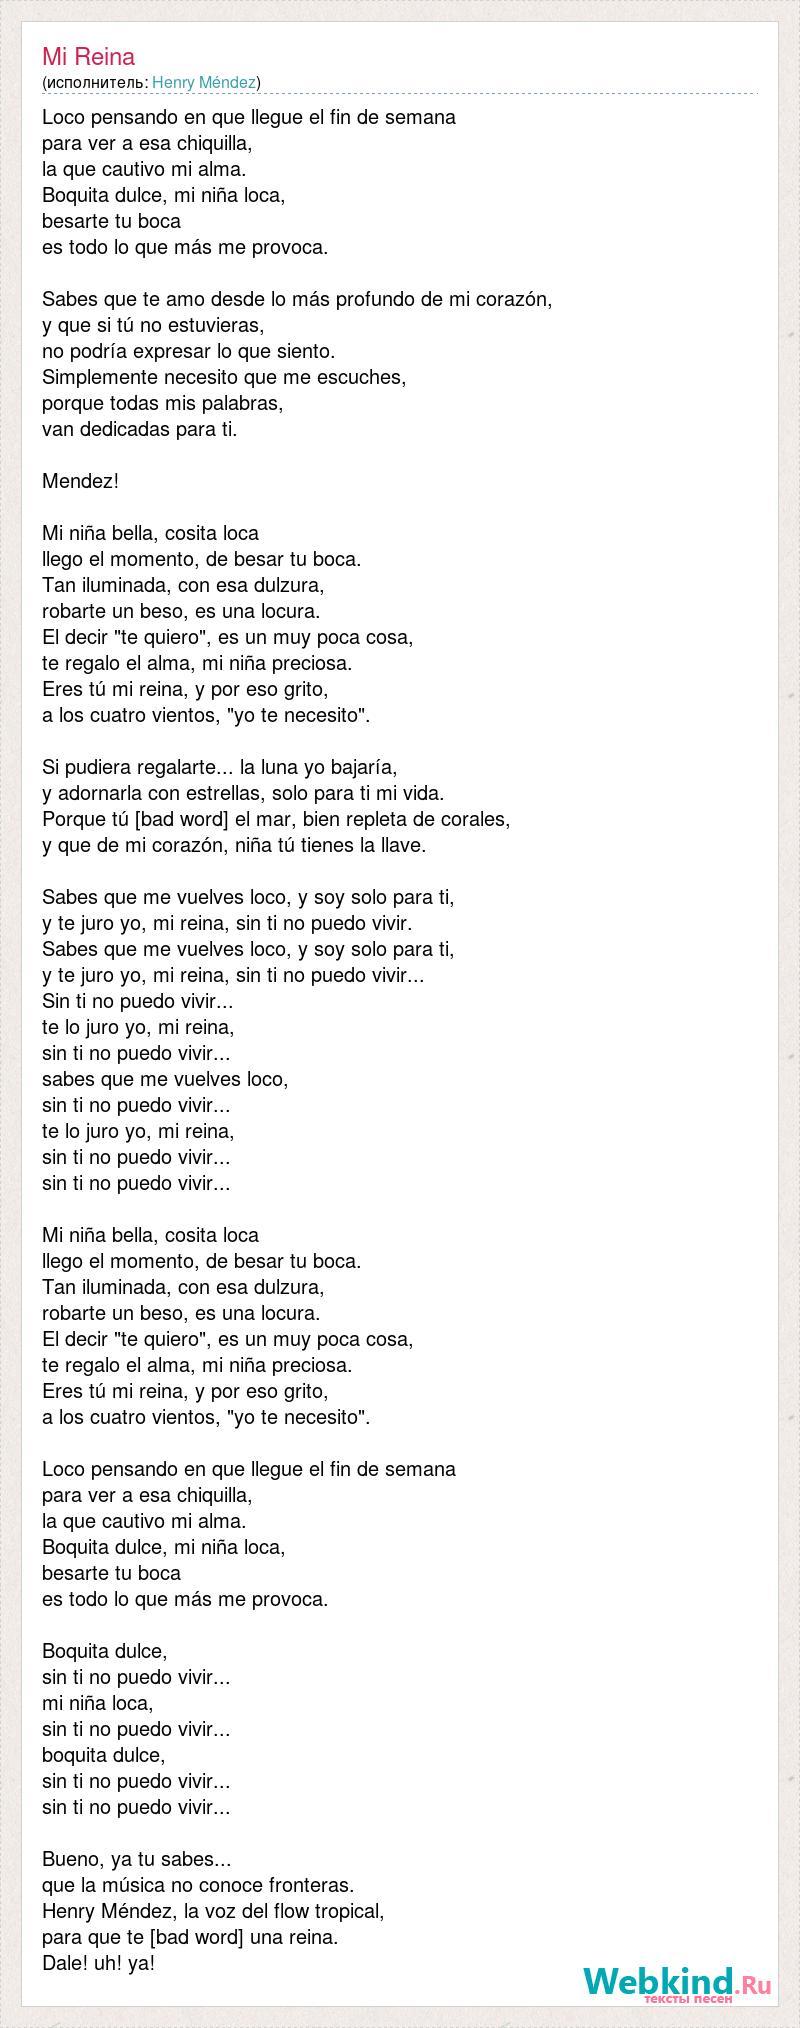 Henry Méndez Mi Reina слова песни